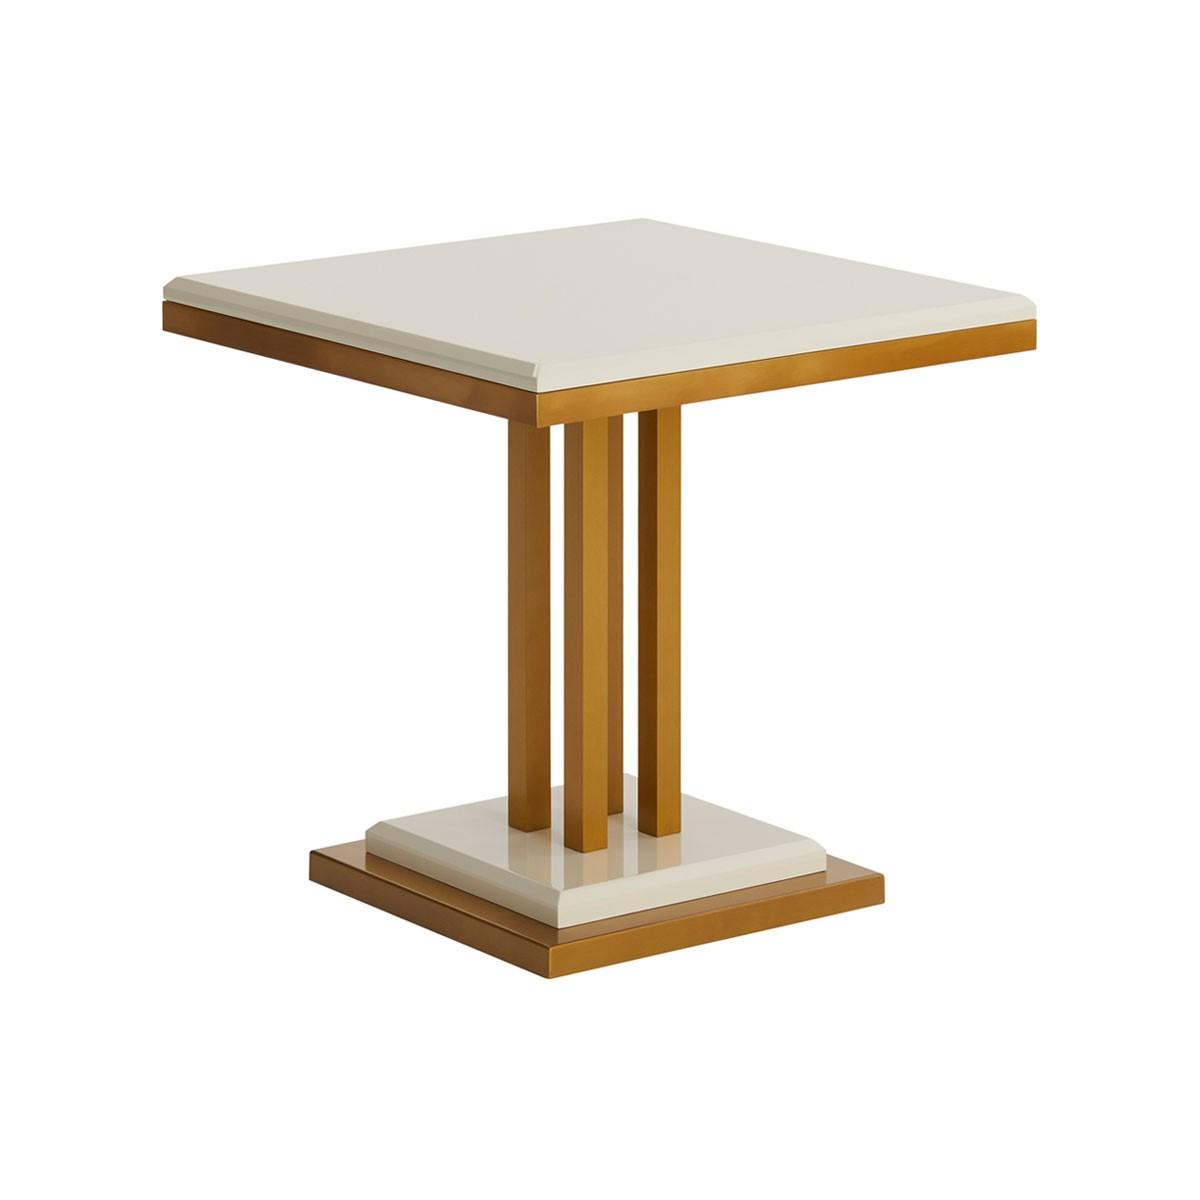 The Conrad Side Table